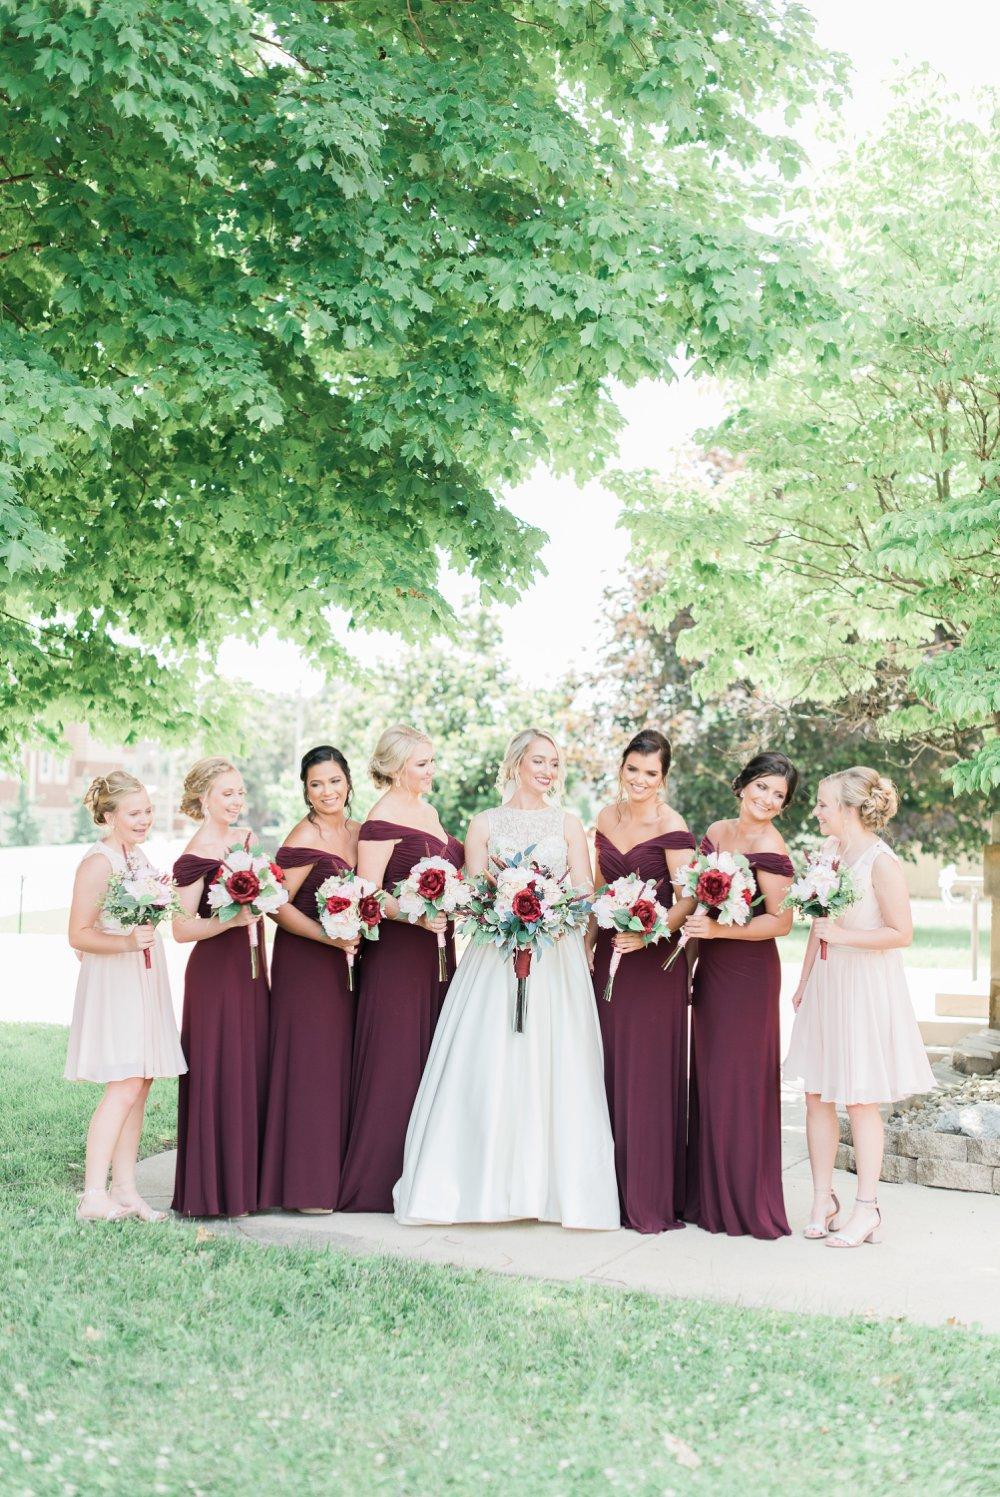 shawnee-lodge-state-park-wedding-portsmouth-ohio_0025.jpg